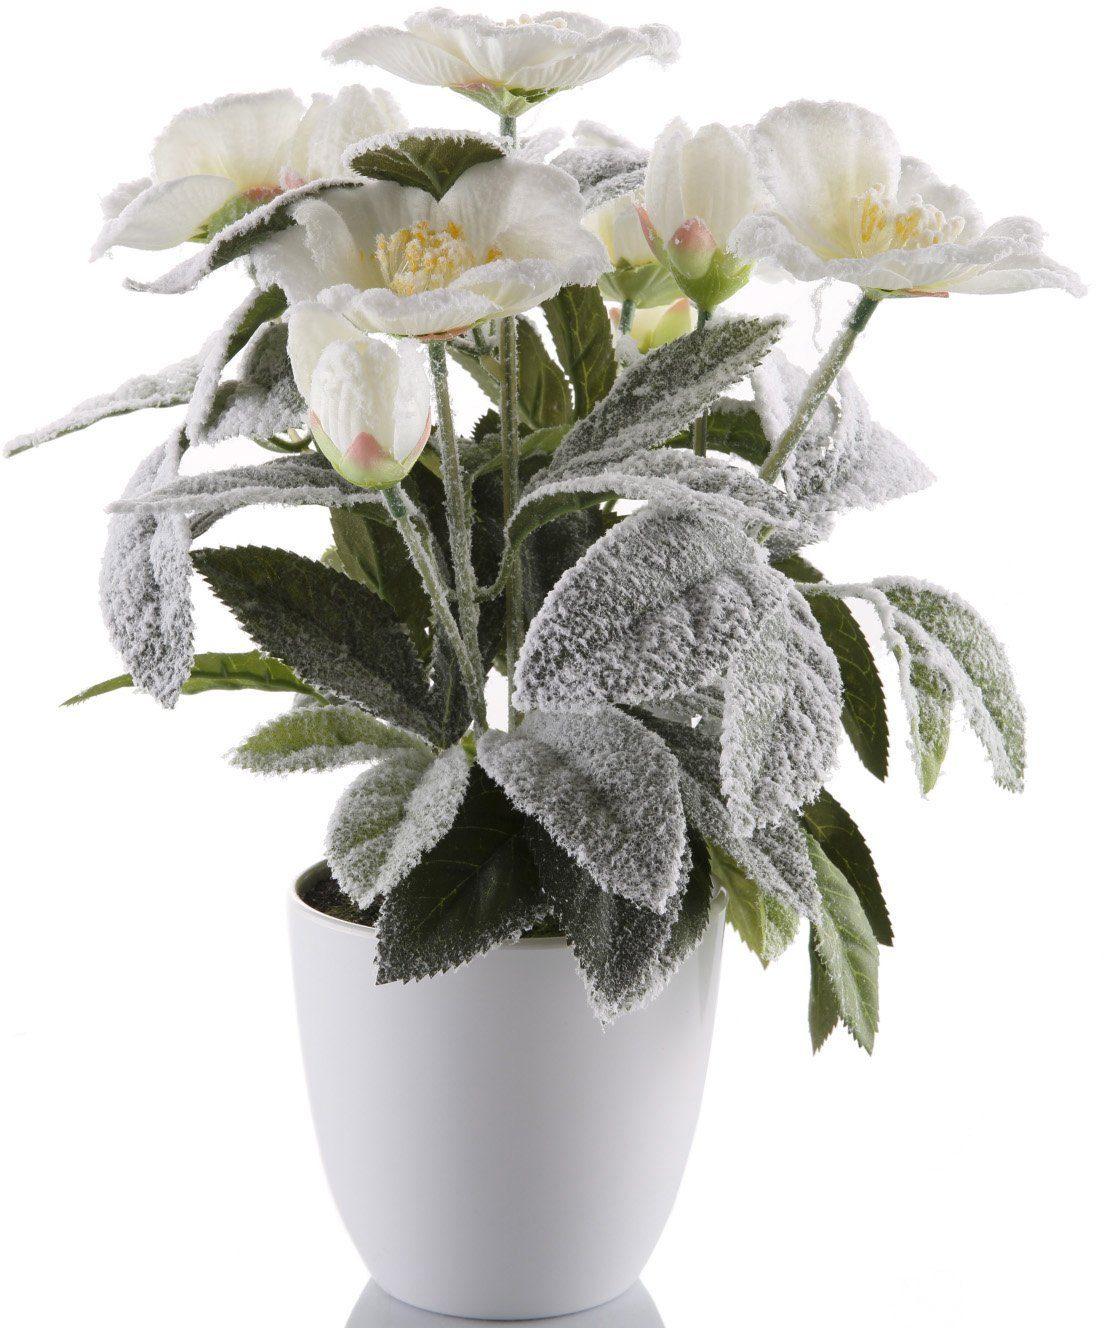 Kunstblume »Christrose«, leicht beschneit